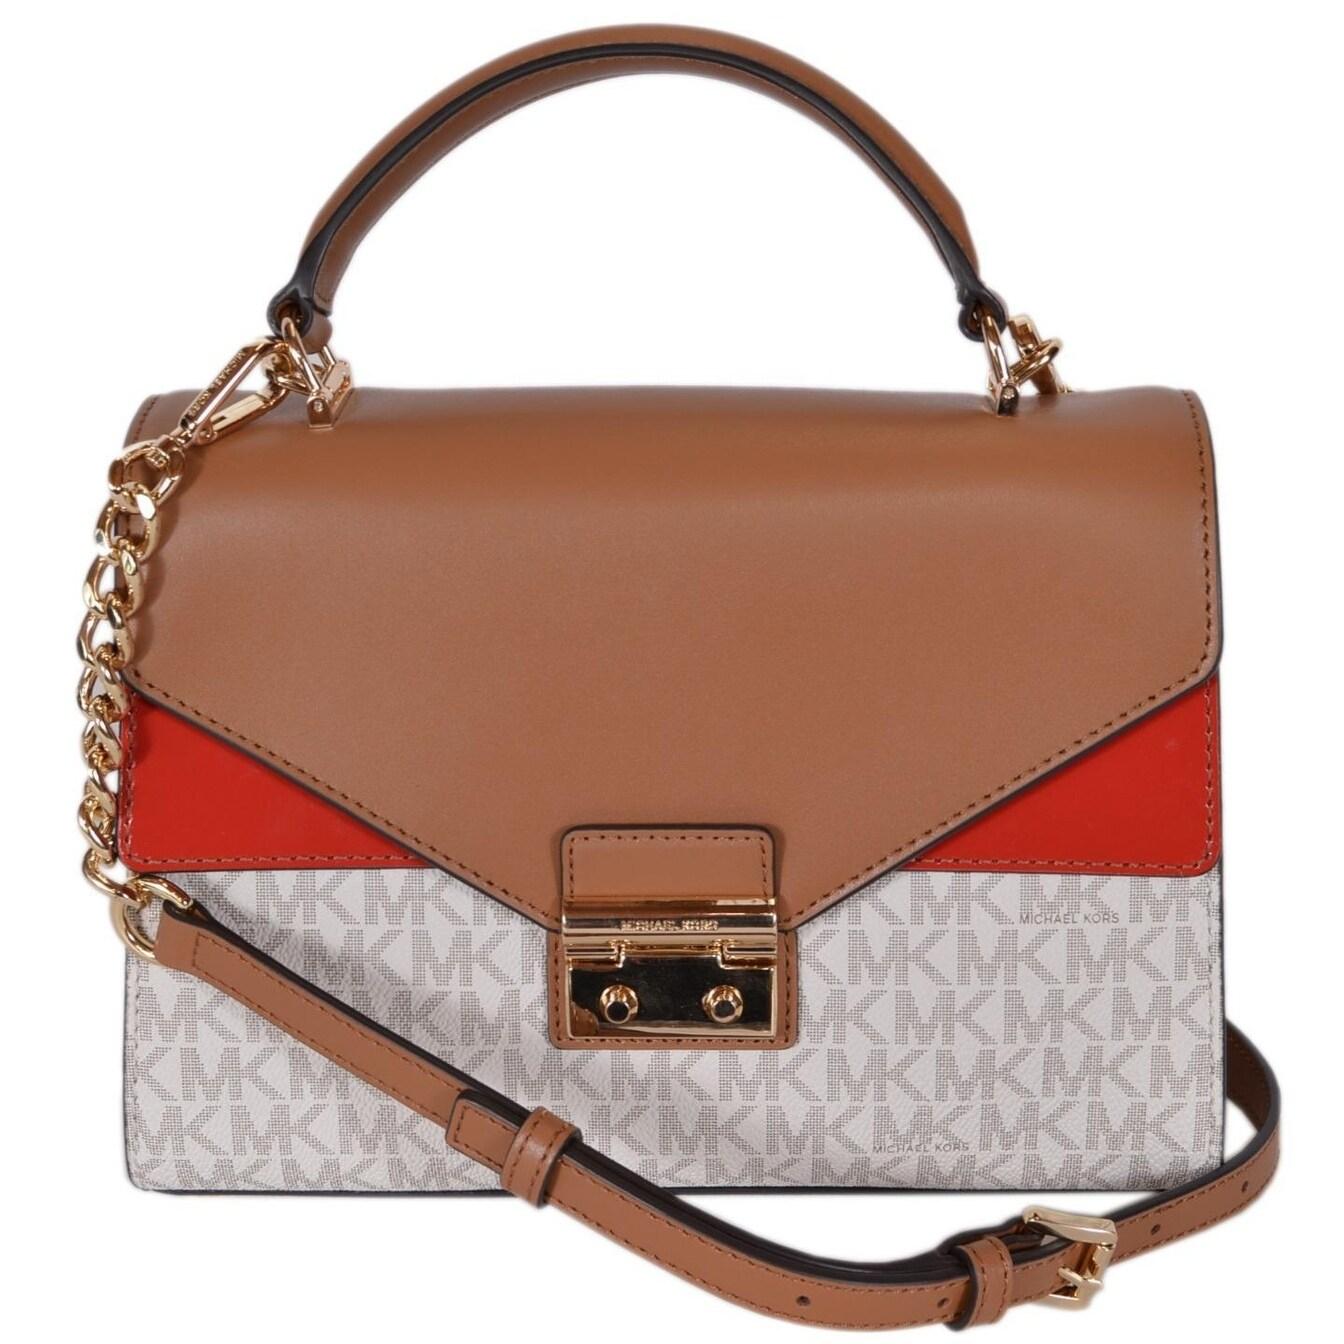 289b96cb1ce3 Multi Michael Kors Handbags